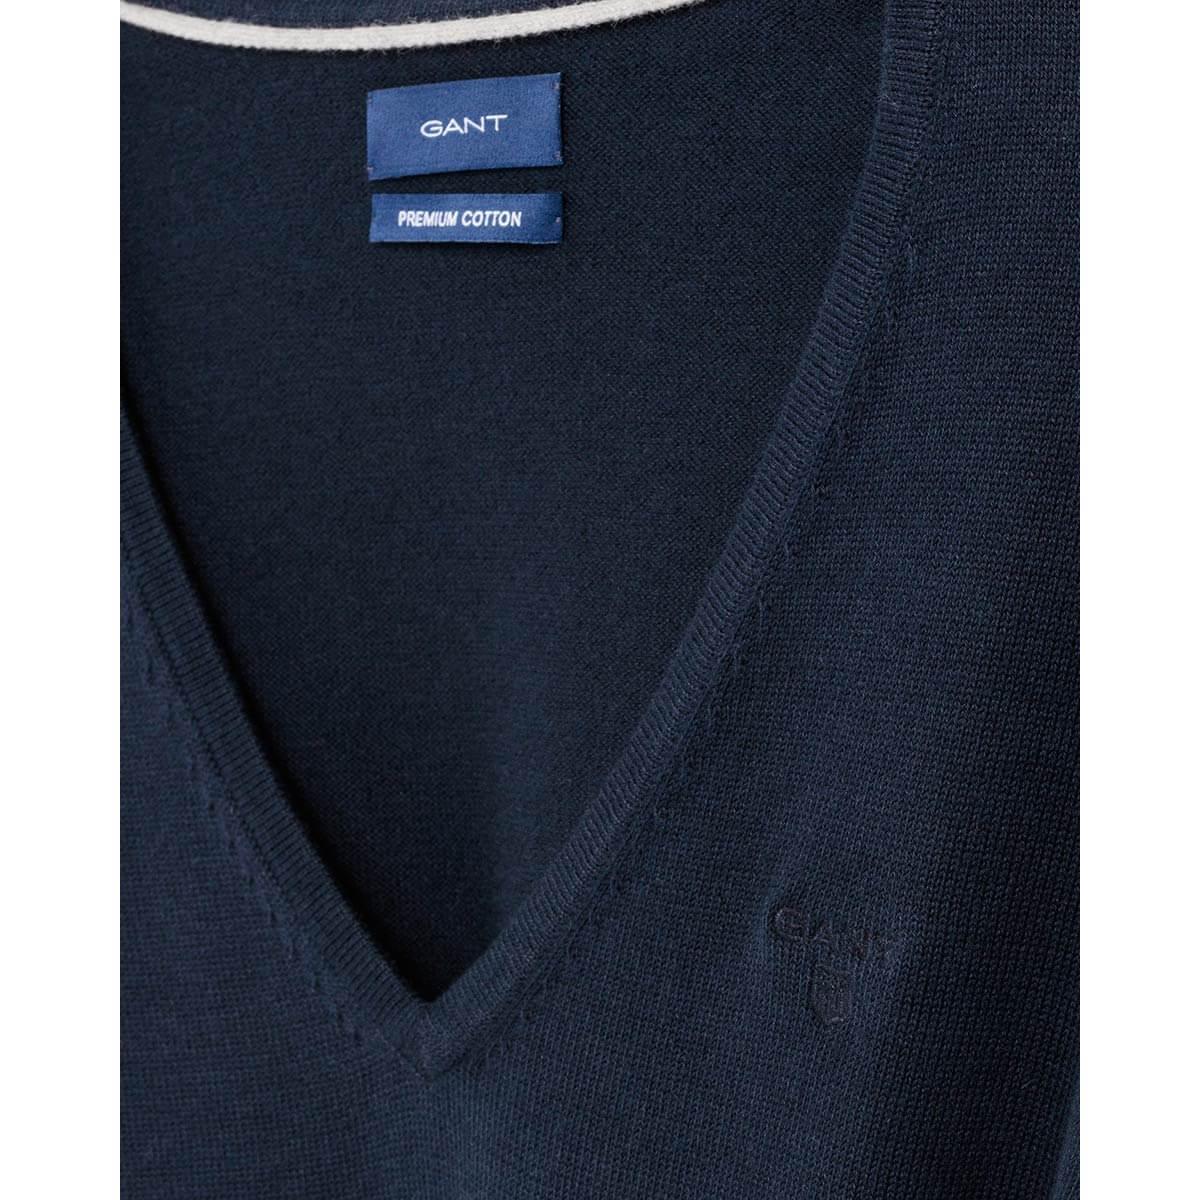 sale retailer 9250a 8a078 Gant Damen Baumwoll Pullover mit V Ausschnitt